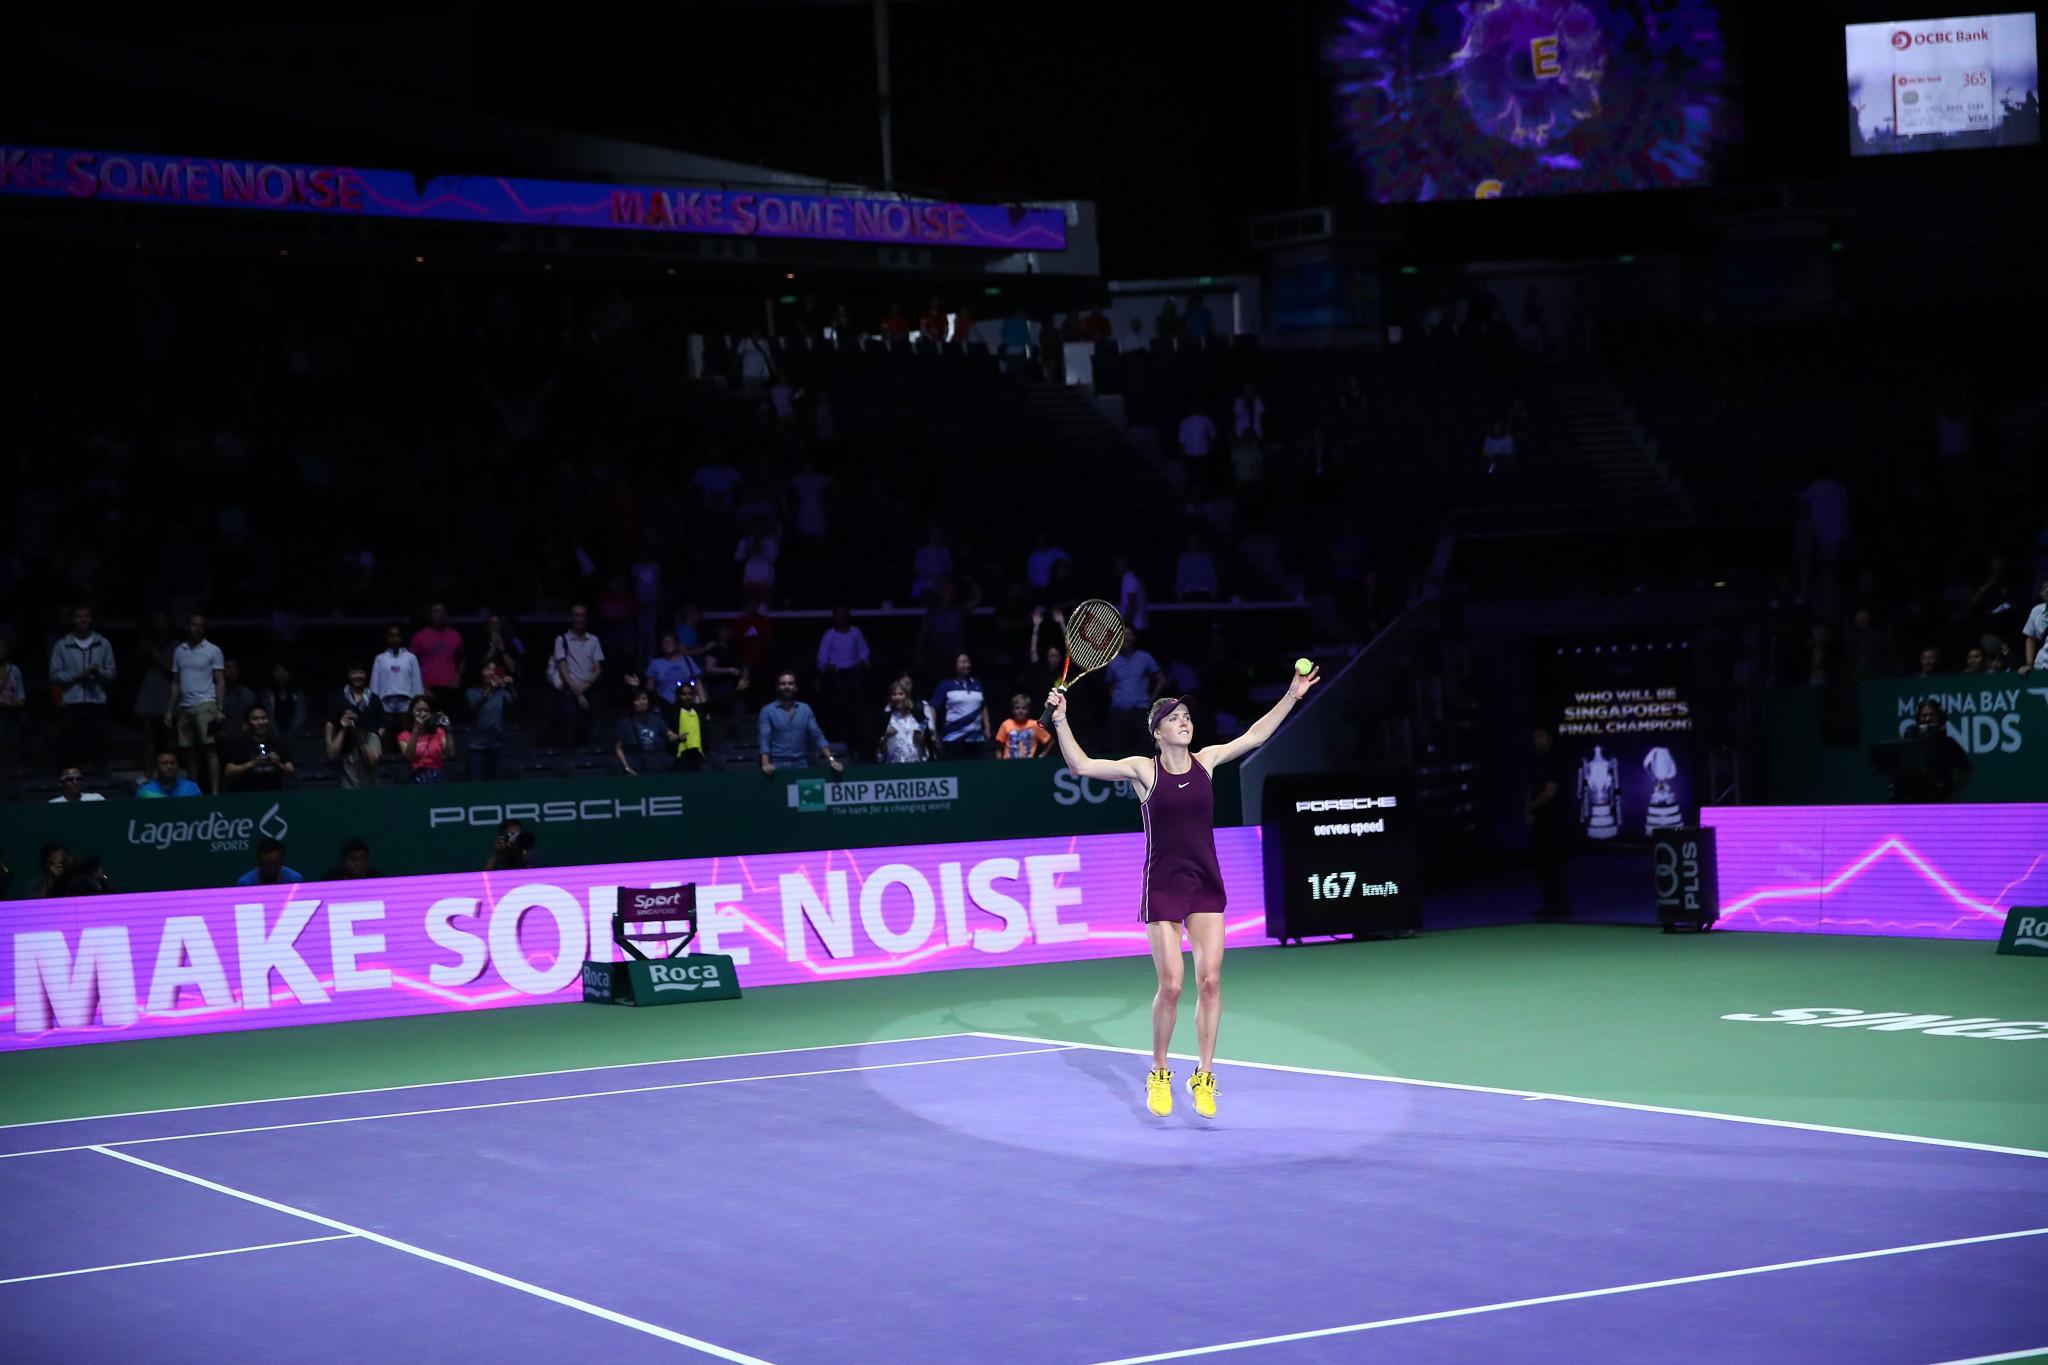 Elina Svitolina beat Kiki Bertens to progress to the final ©Getty Images